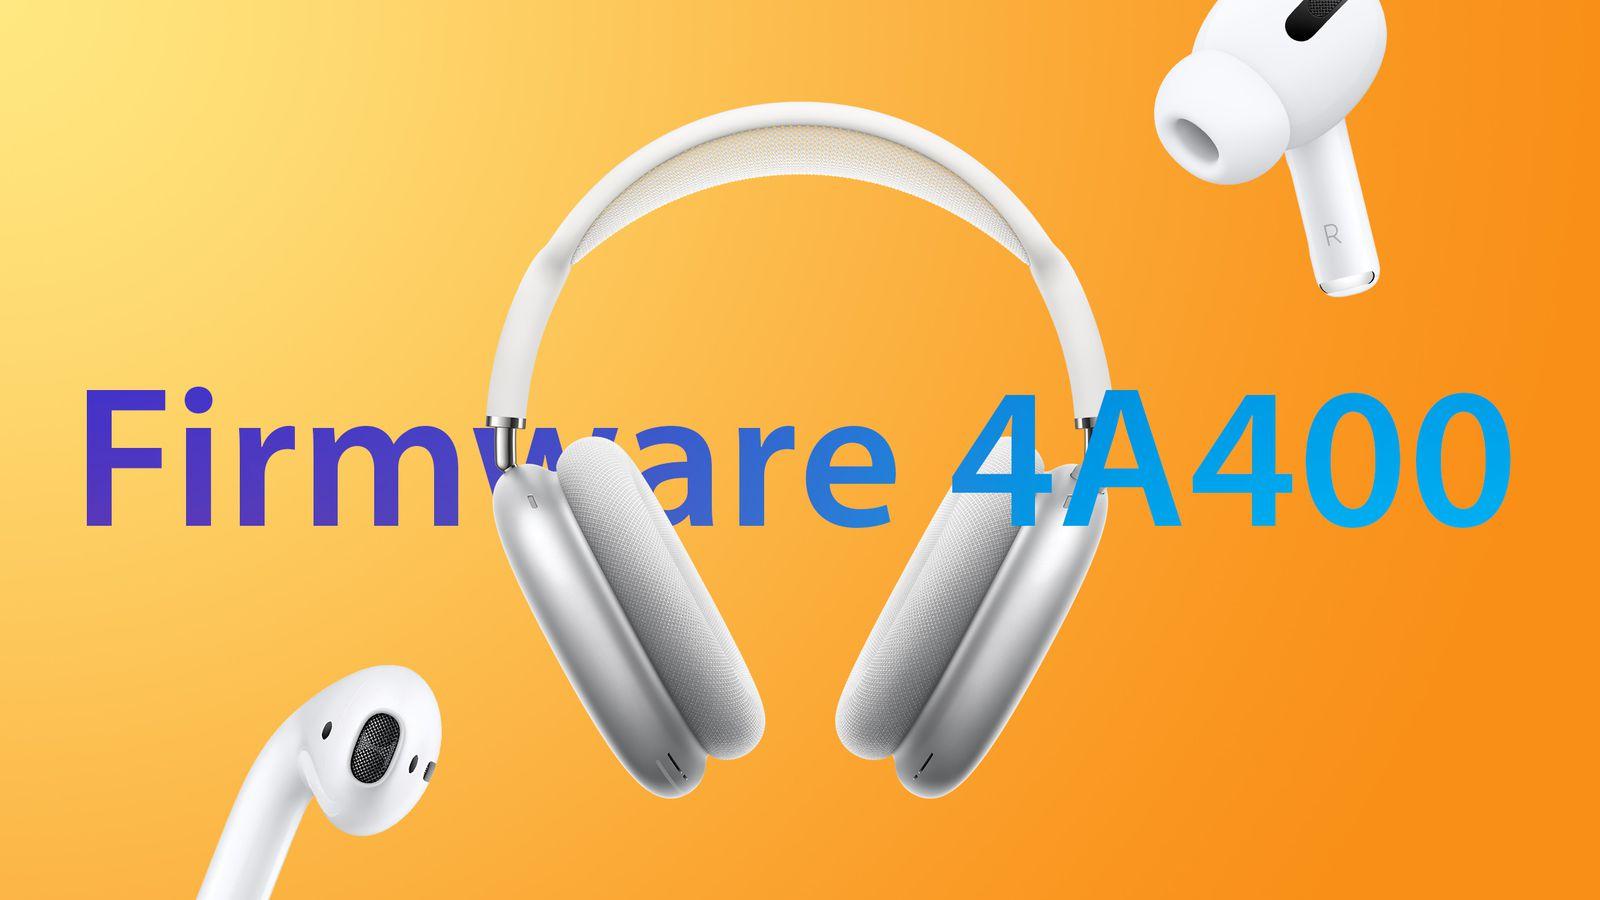 AirPods-Firmware-Update-4A400-Feature